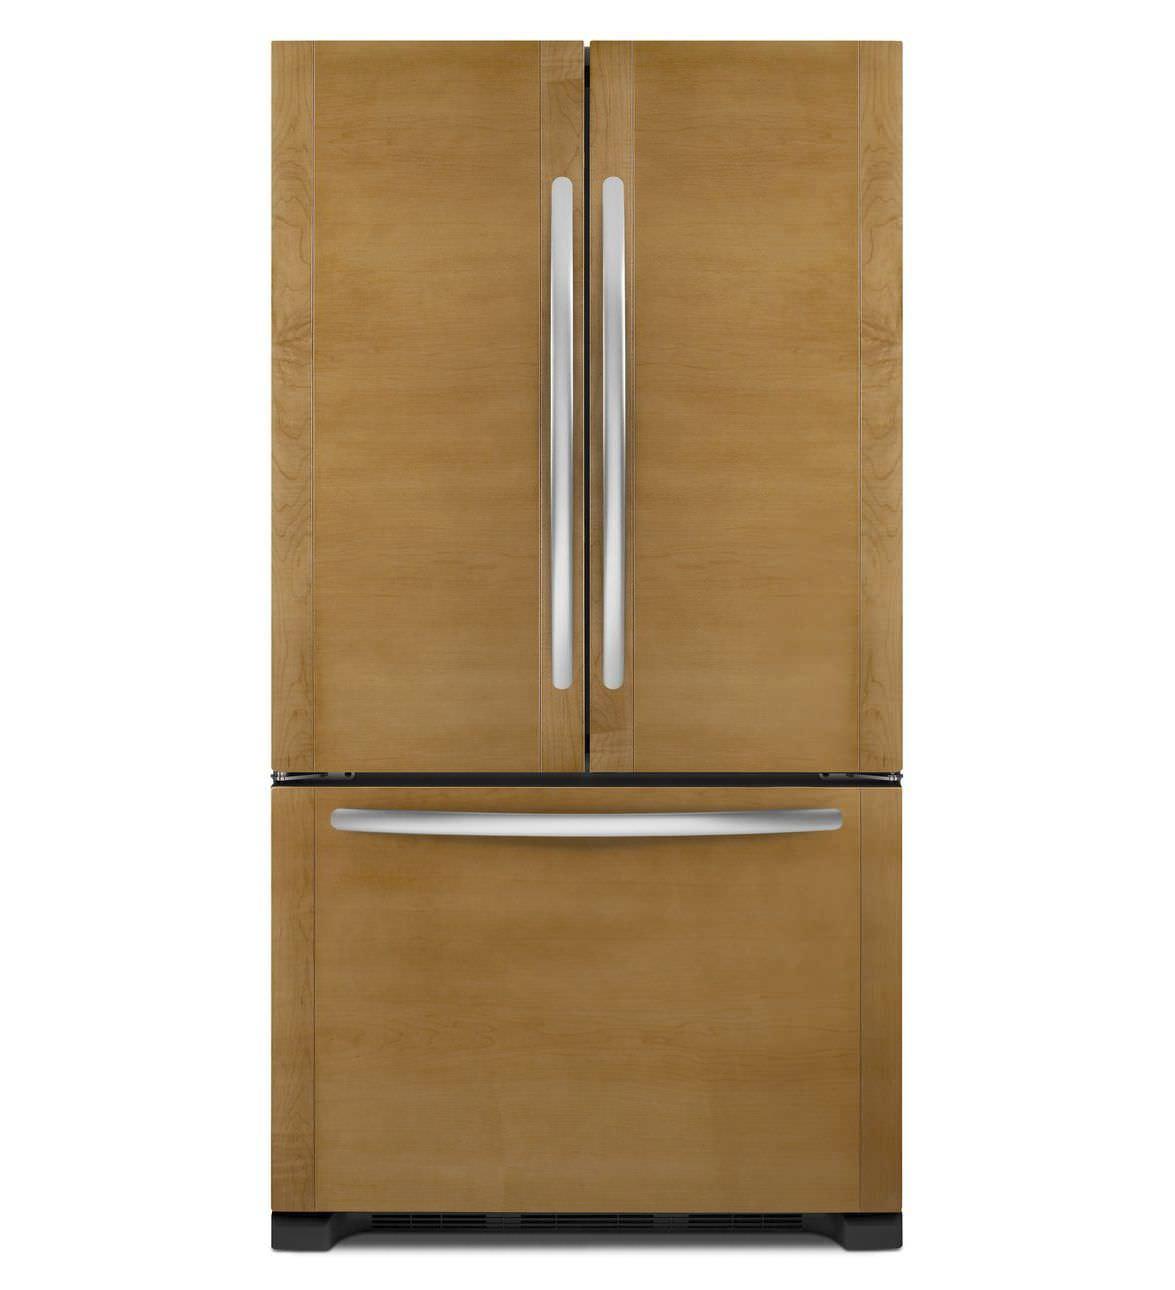 American Refrigerator / Wooden / Energy Efficient / Energy Star   KFCO22EVBL